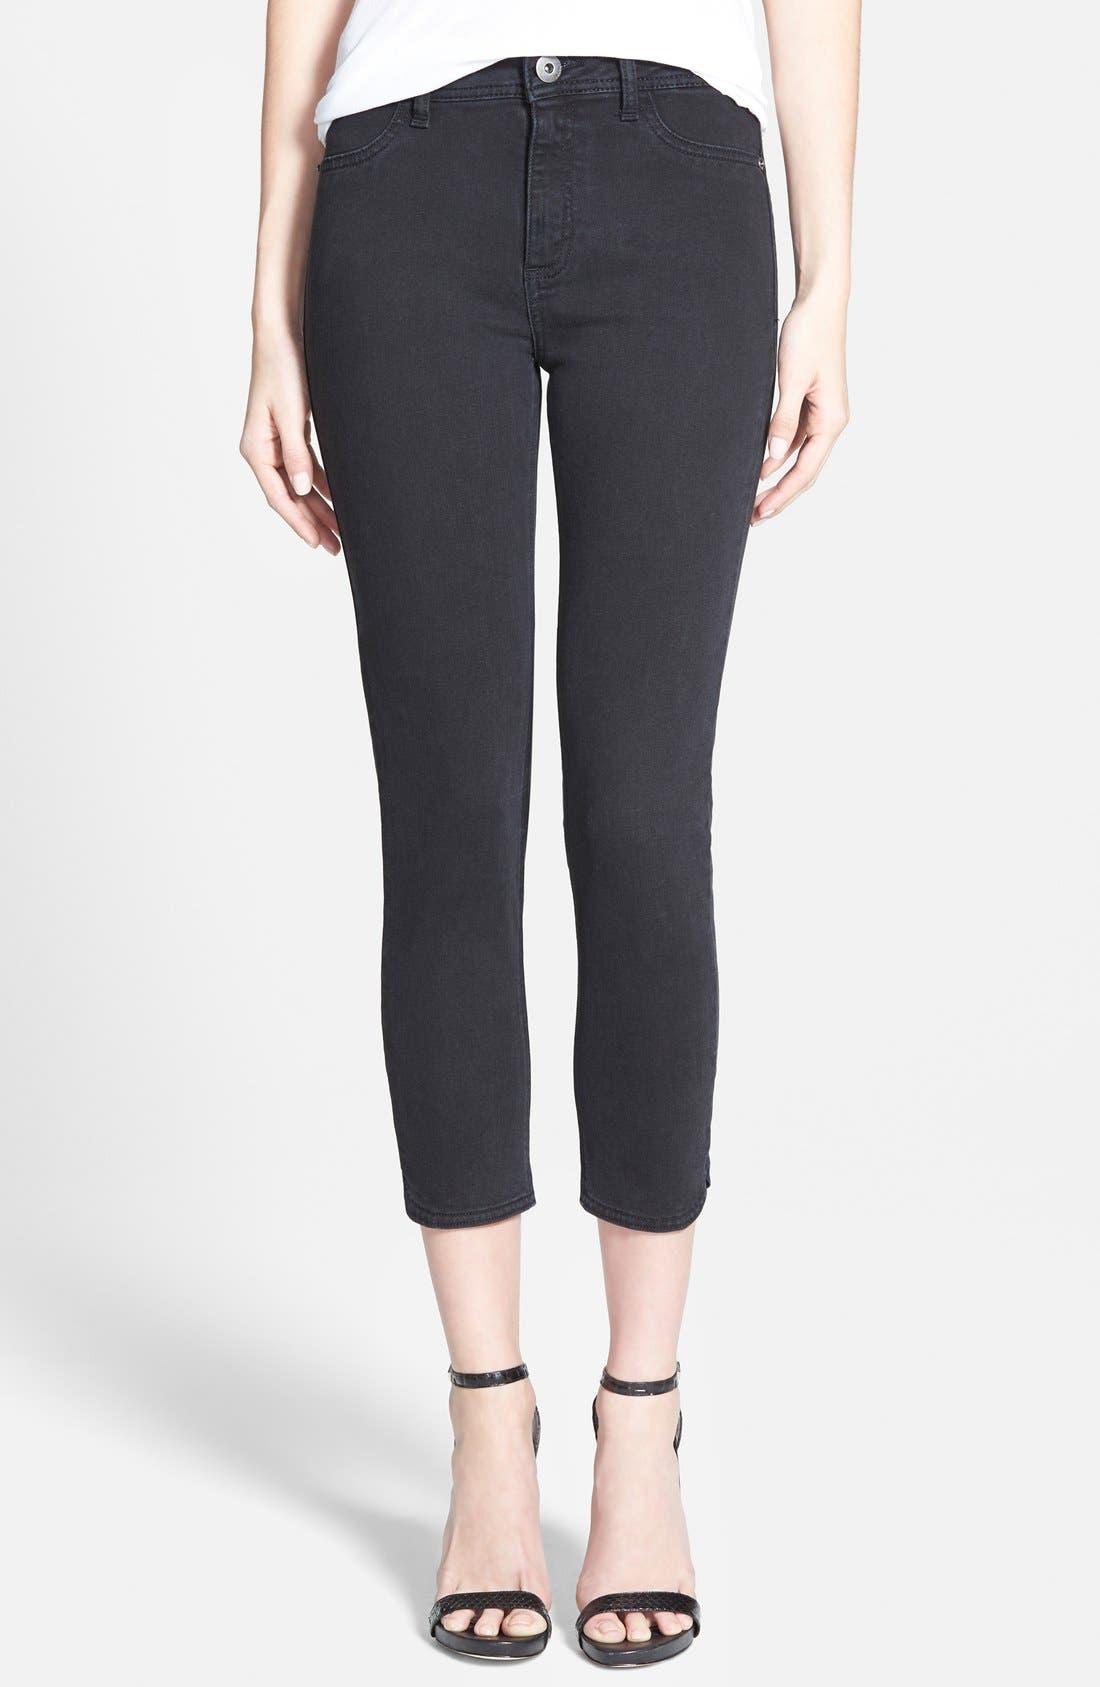 Alternate Image 1 Selected - DL1961 'Bardot' Crop Skinny Jeans (Rhett)